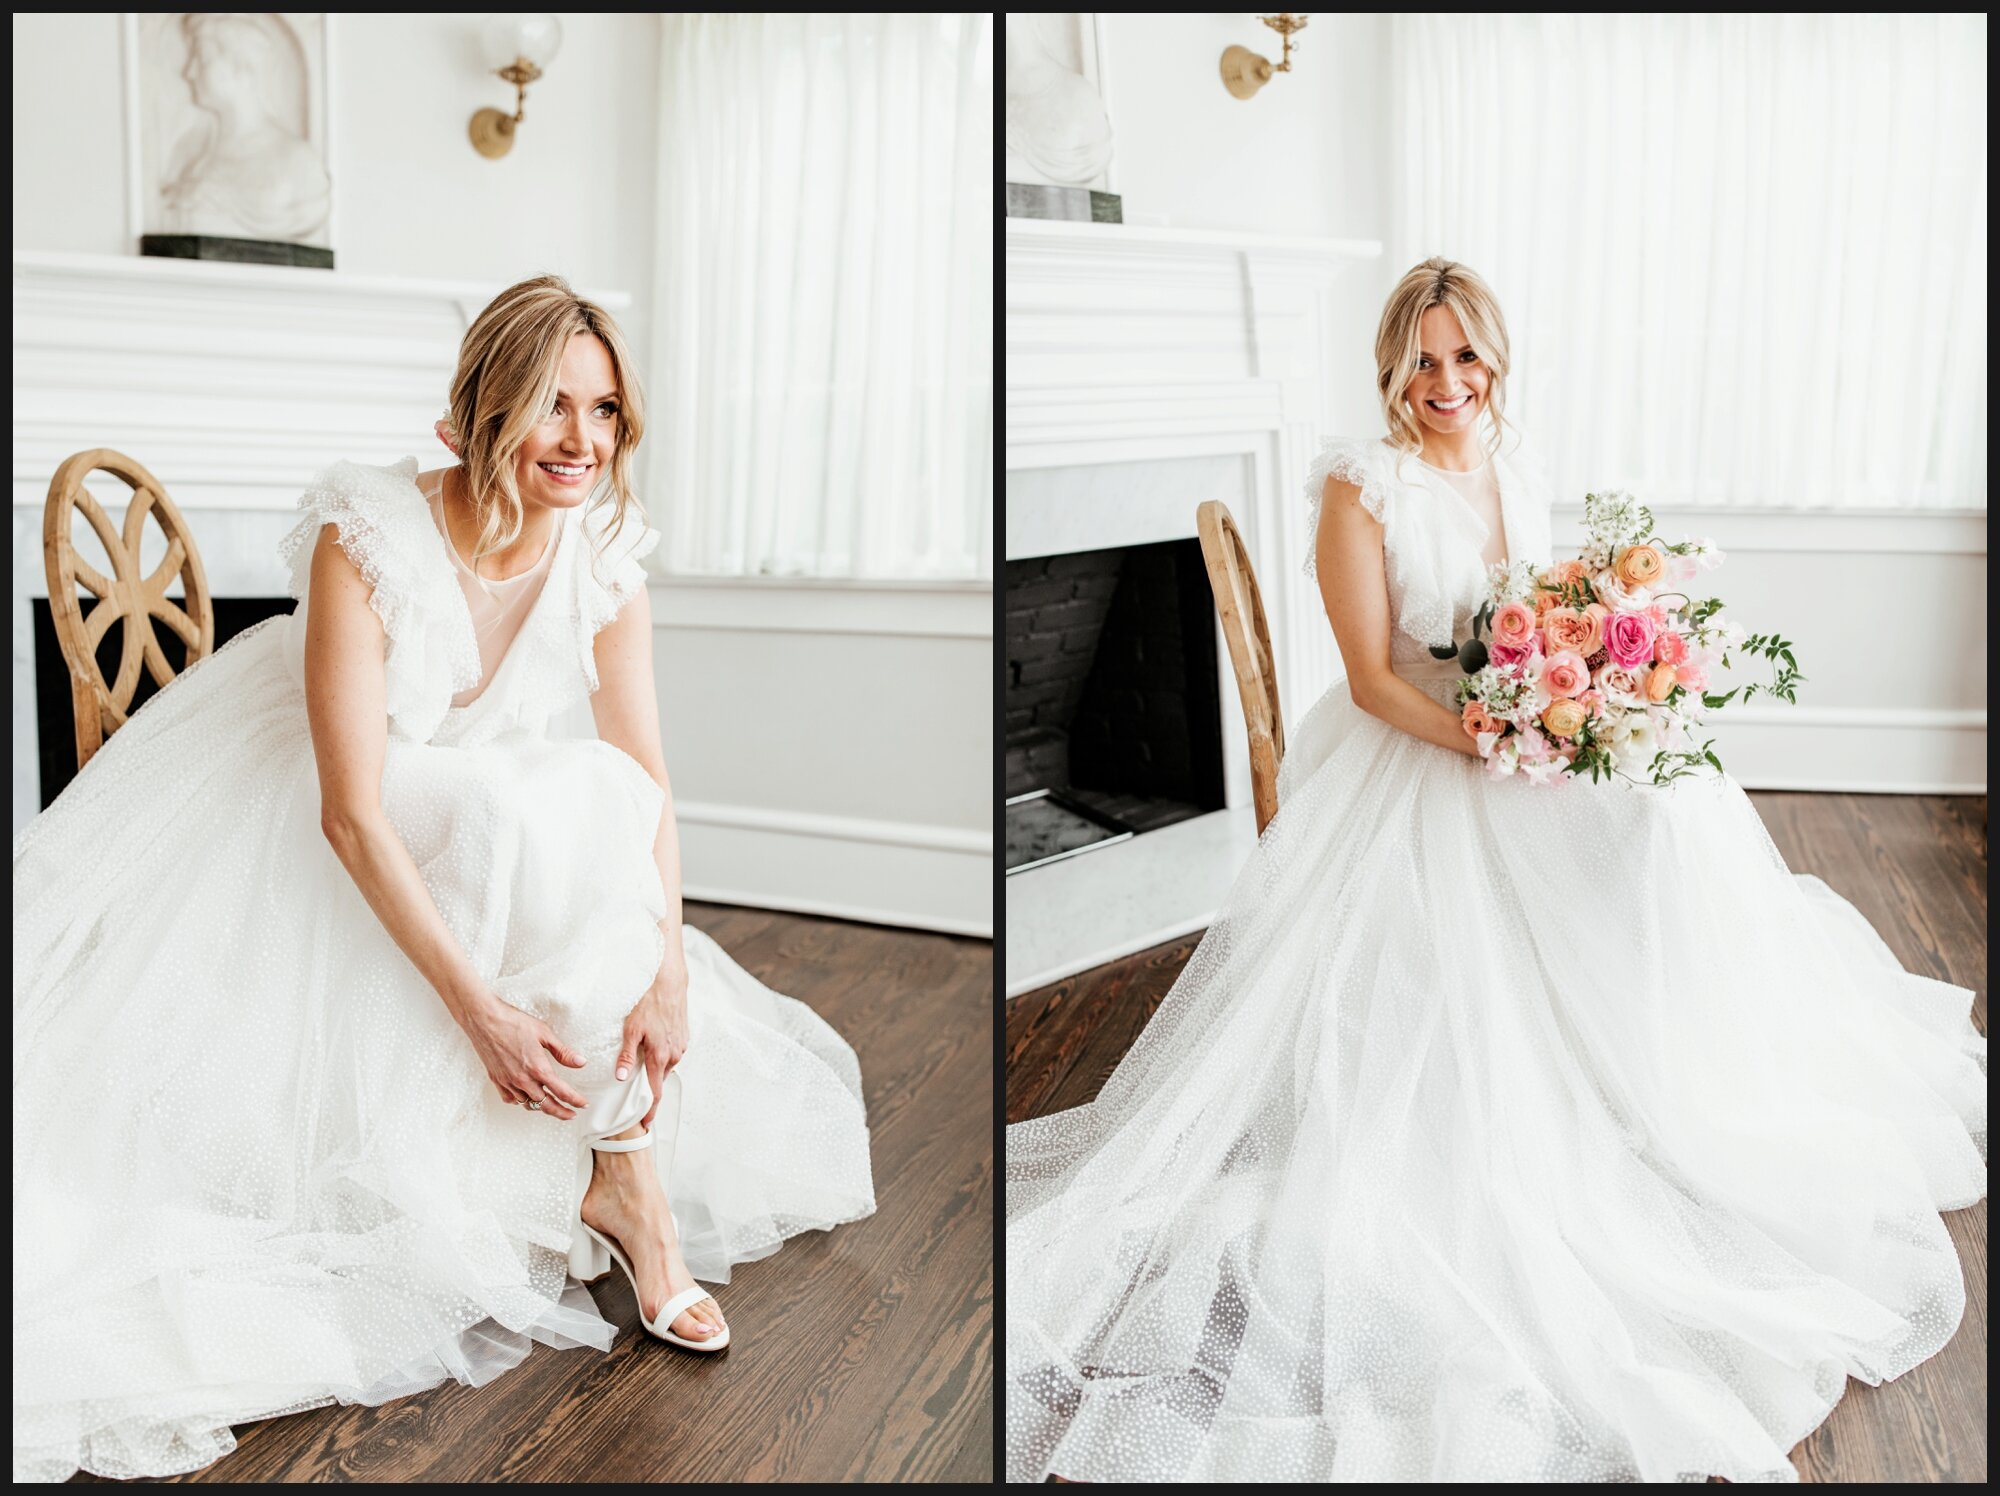 Orlando-Wedding-Photographer-destination-wedding-photographer-florida-wedding-photographer-hawaii-wedding-photographer_0701.jpg